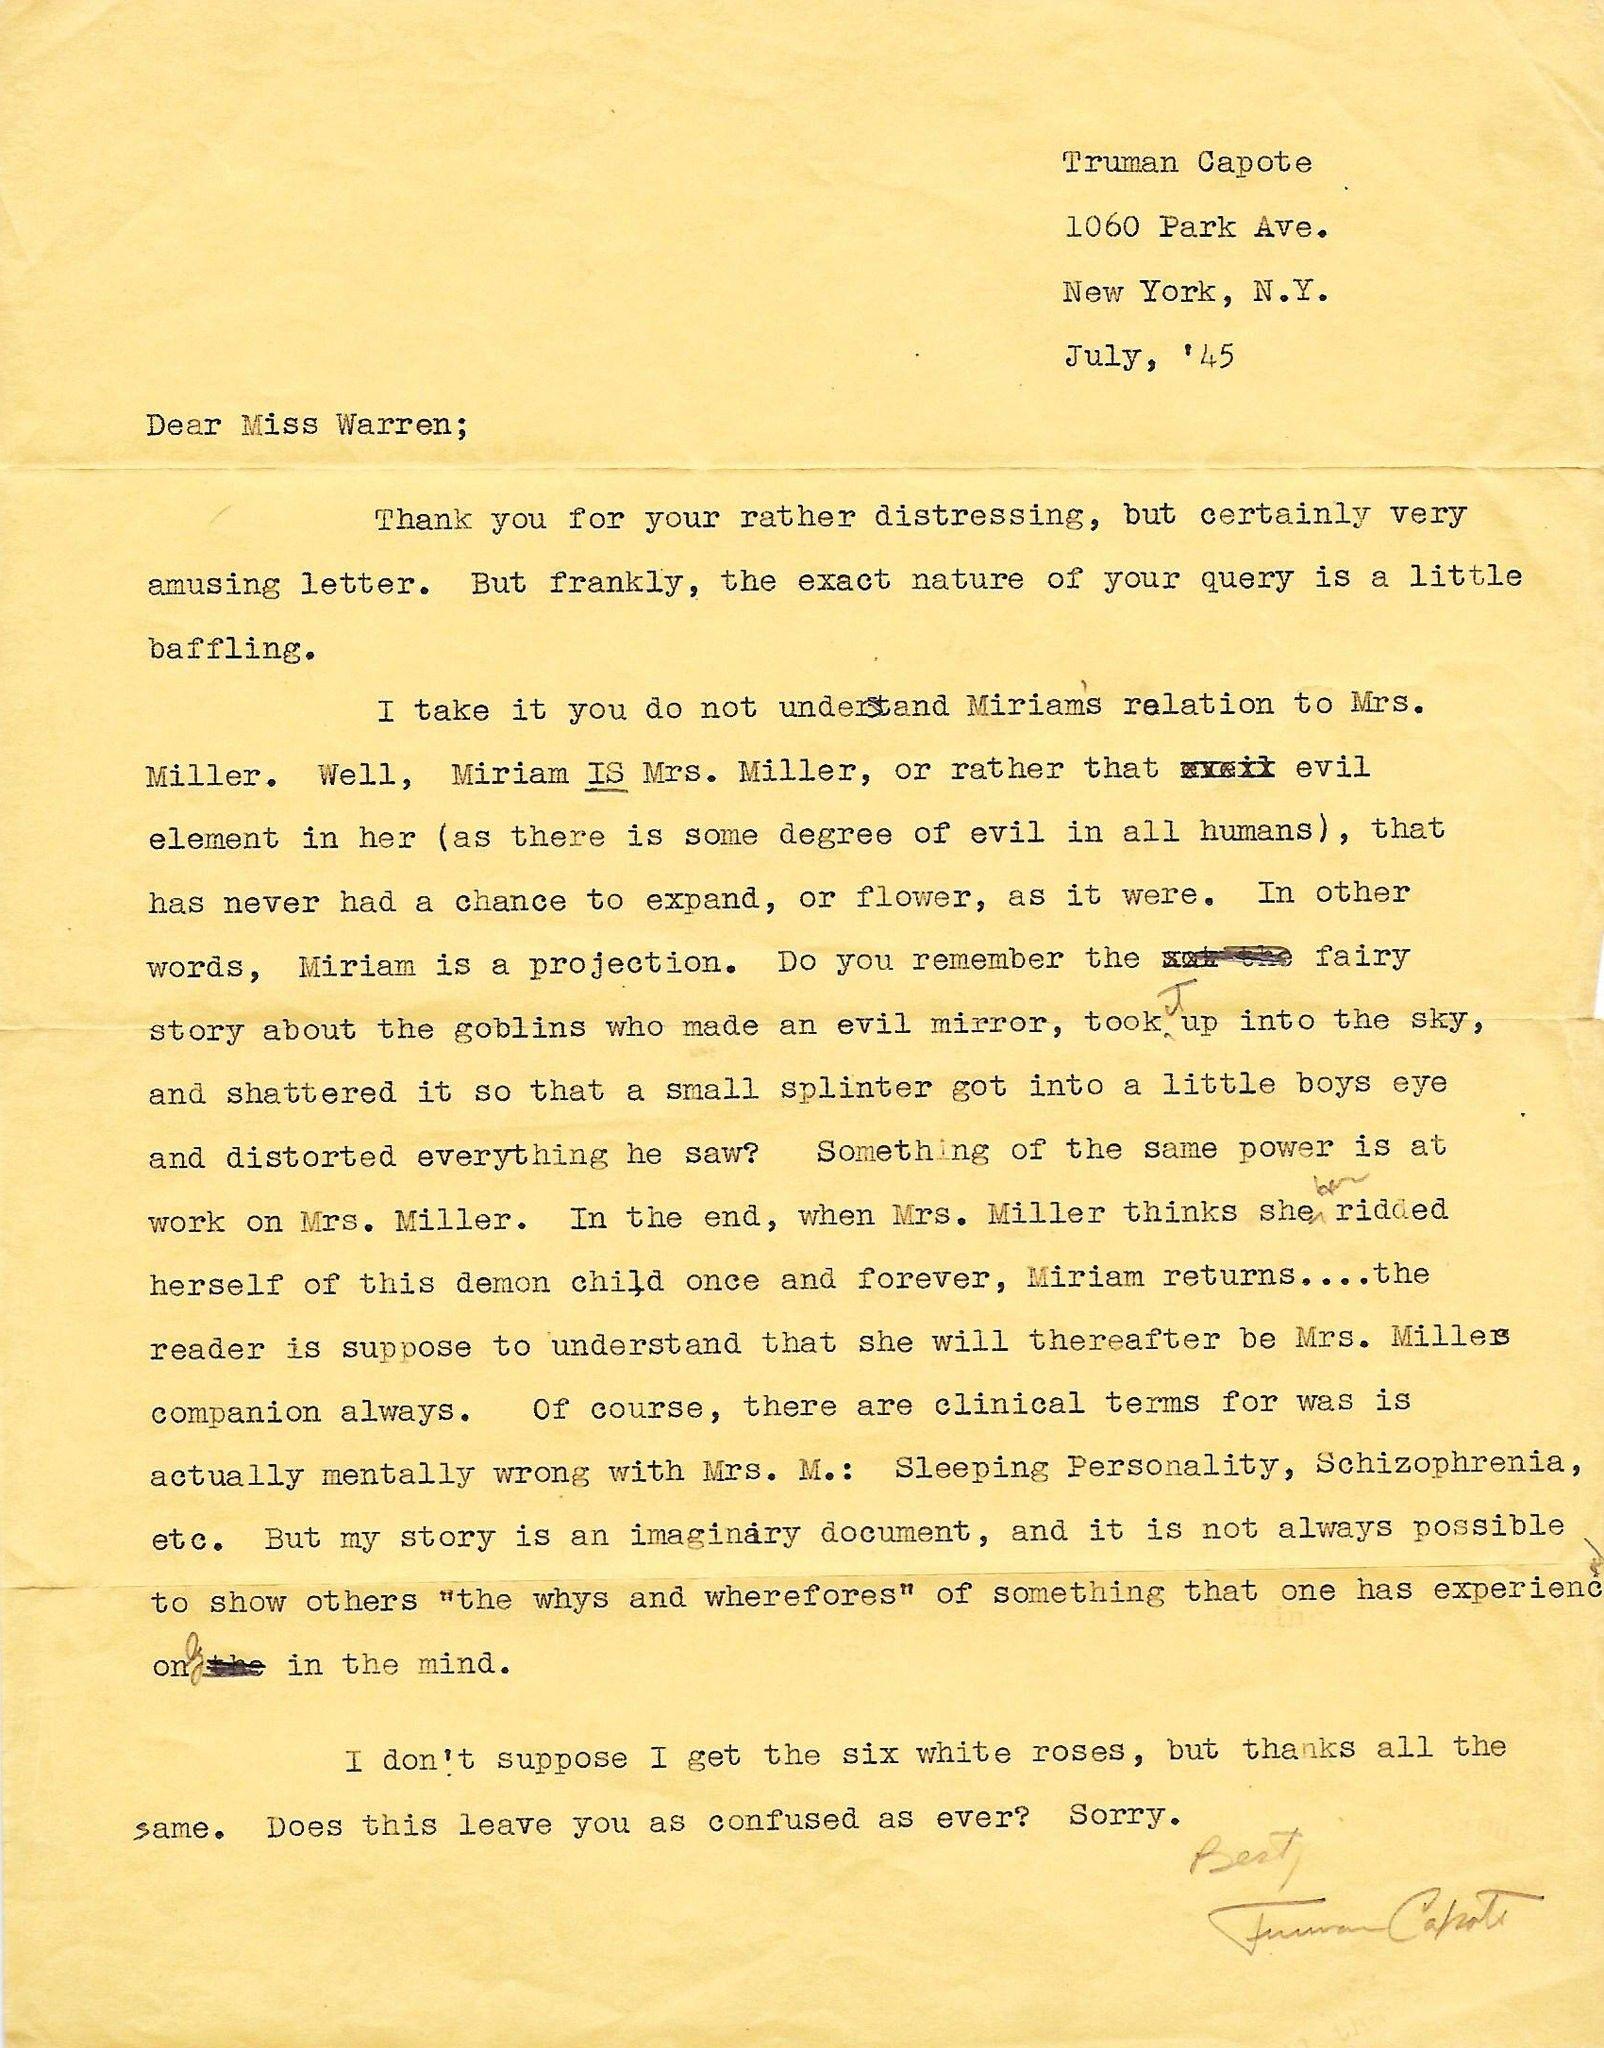 Dear Reader You Misunderstood My Story Signed Truman Capote Truman Capote Capote Truman